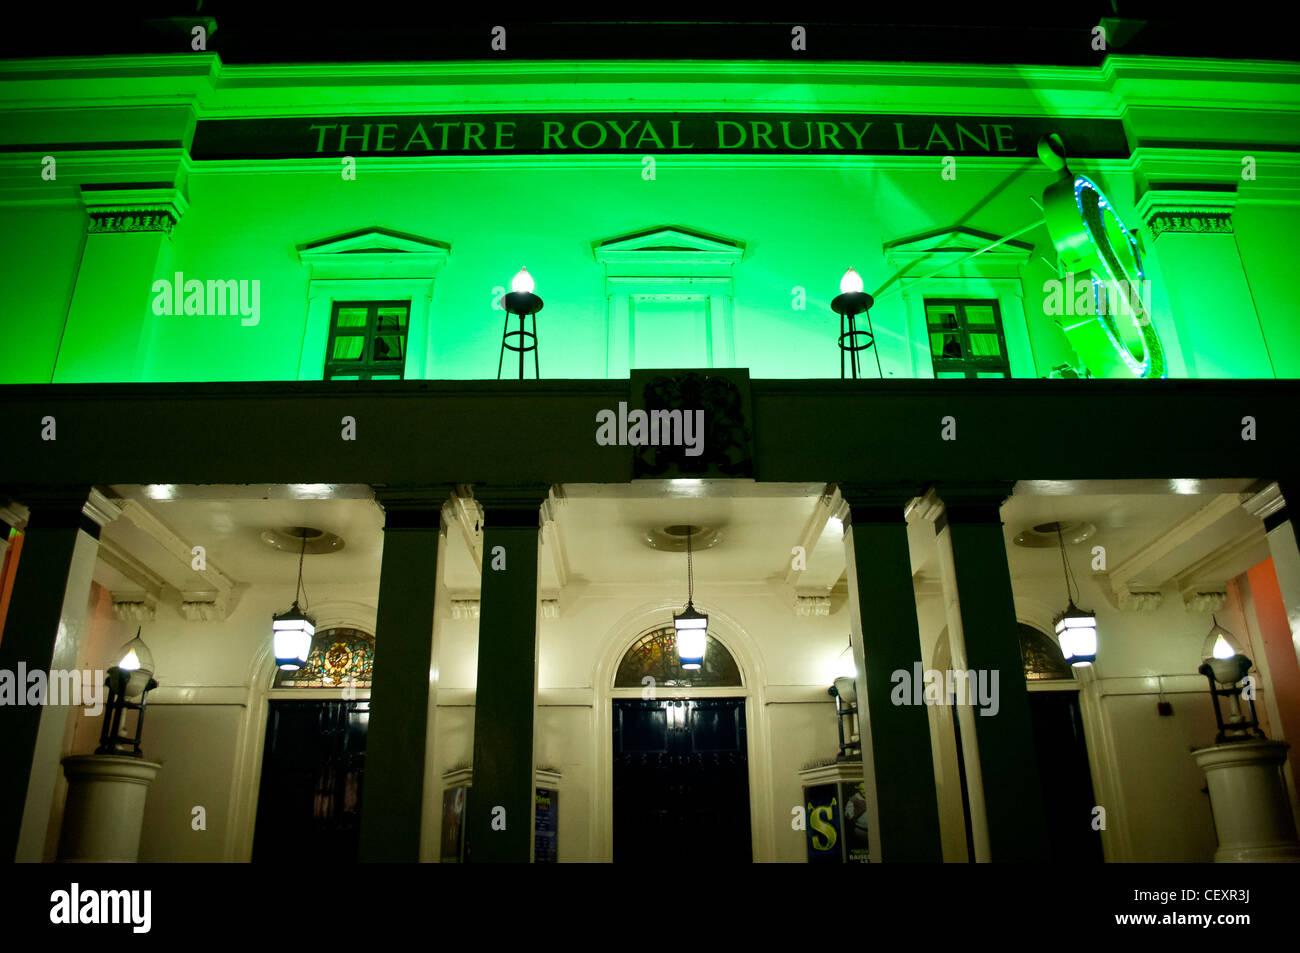 Theatre Royal Drury Lane, Covent Garden, , London, UK - Stock Image